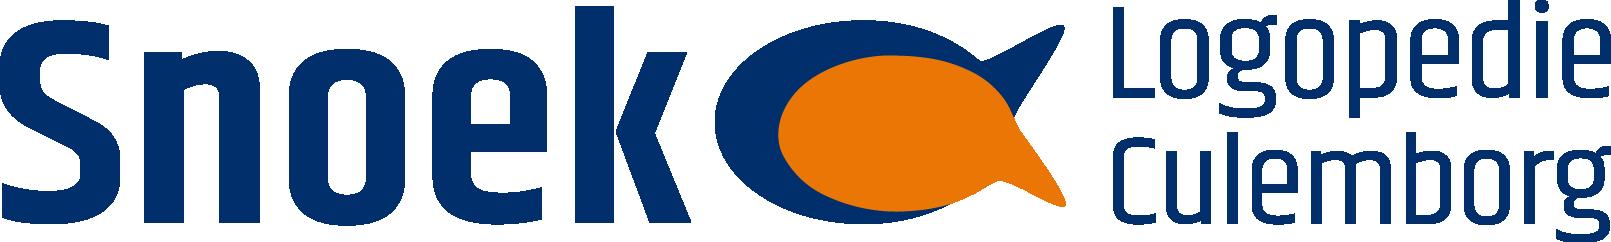 Logopedie Culemborg